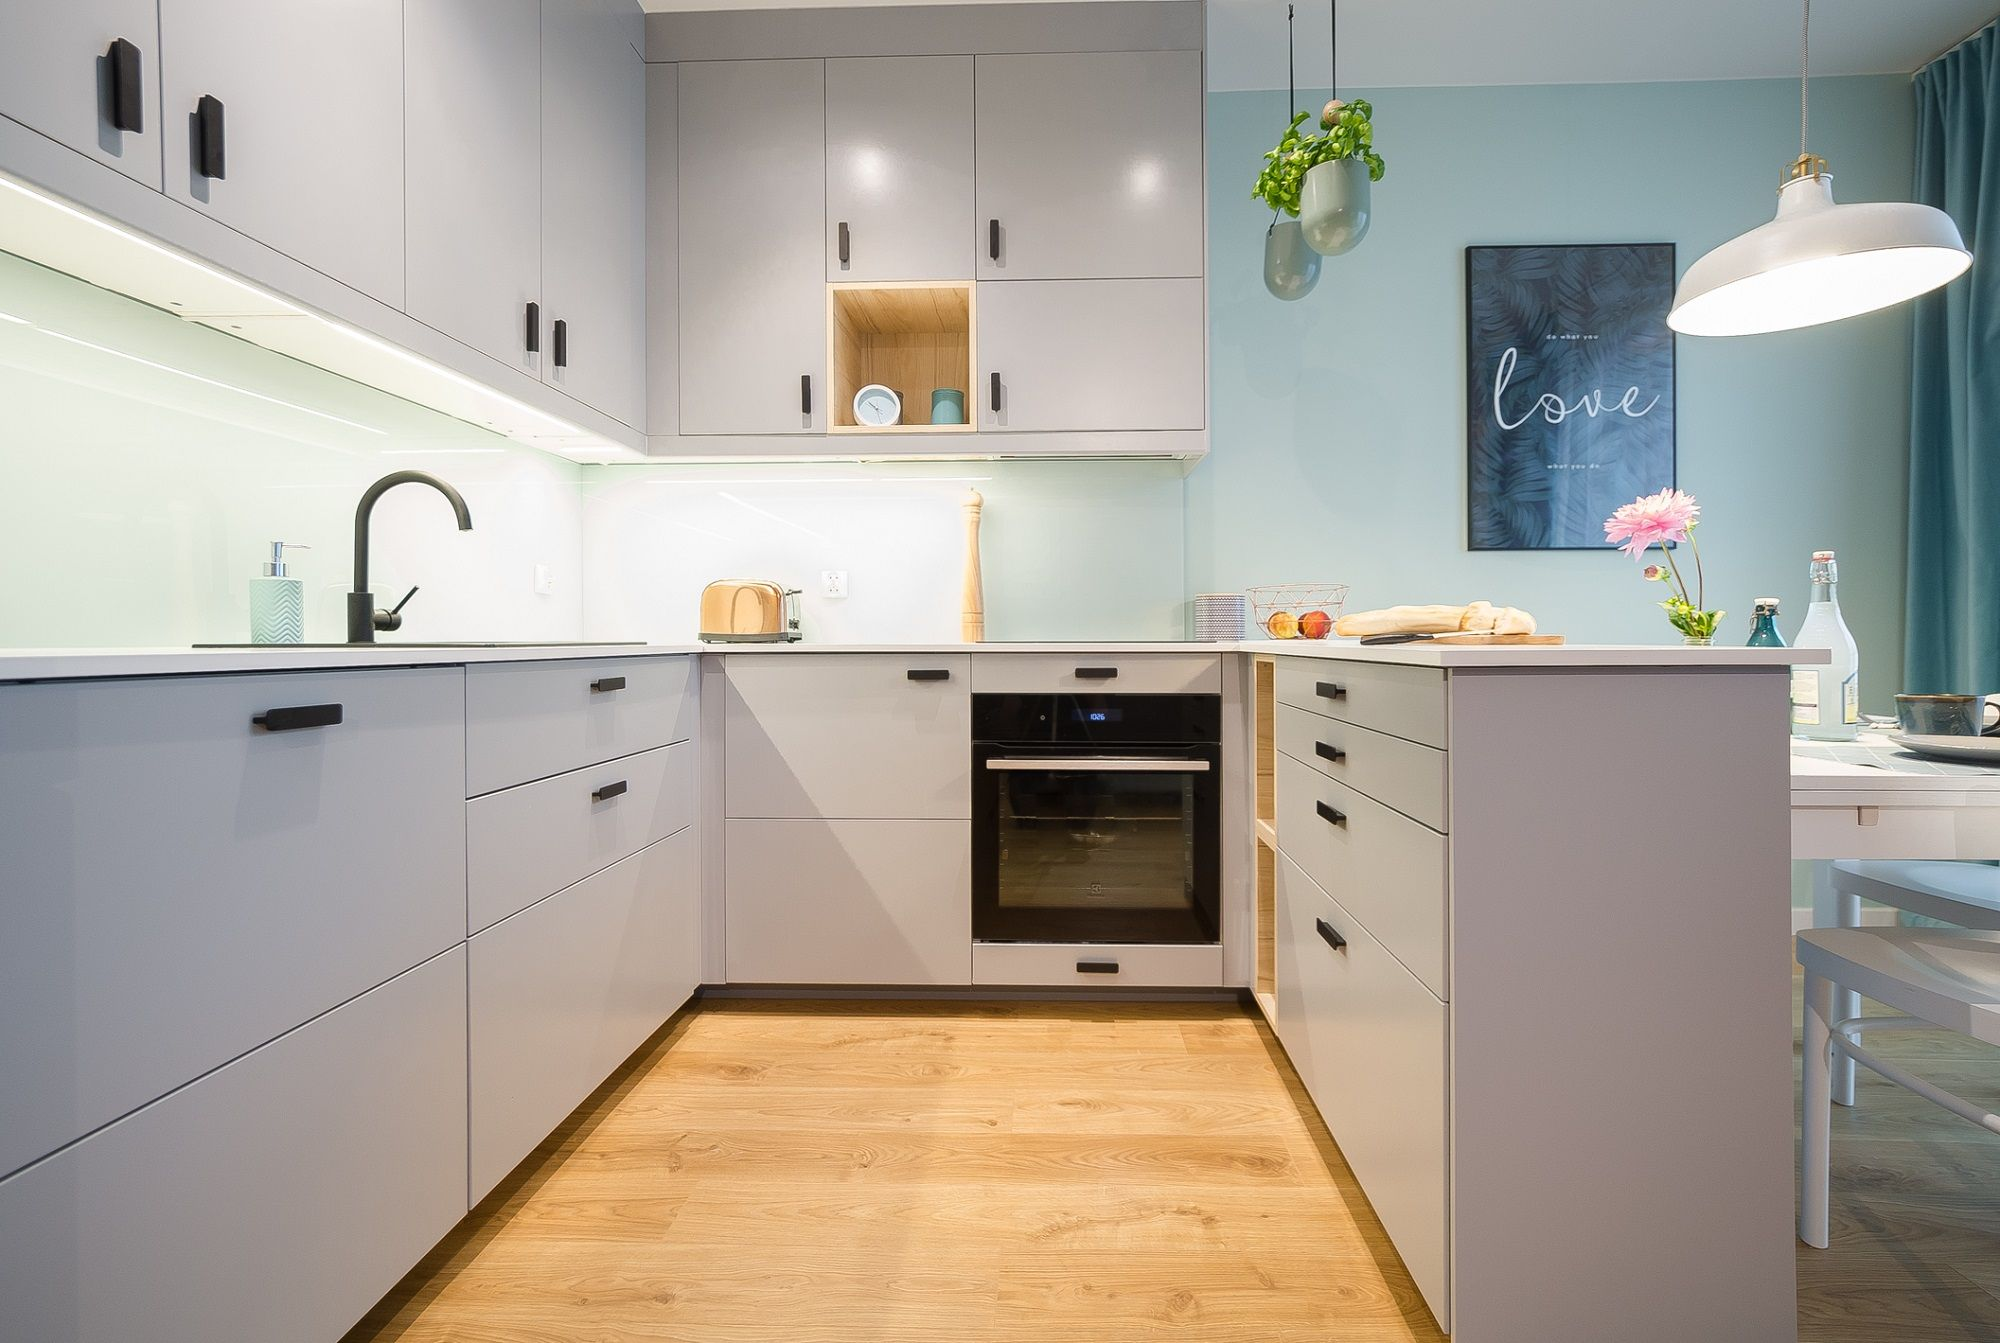 Foorni Pl Projekt Moa Design White Kitchen Matte Surface Mint Wall Basil Wood Floor Wooden Ideas Kuchnia White Kitchen Kitchen Kitchen Cabinets